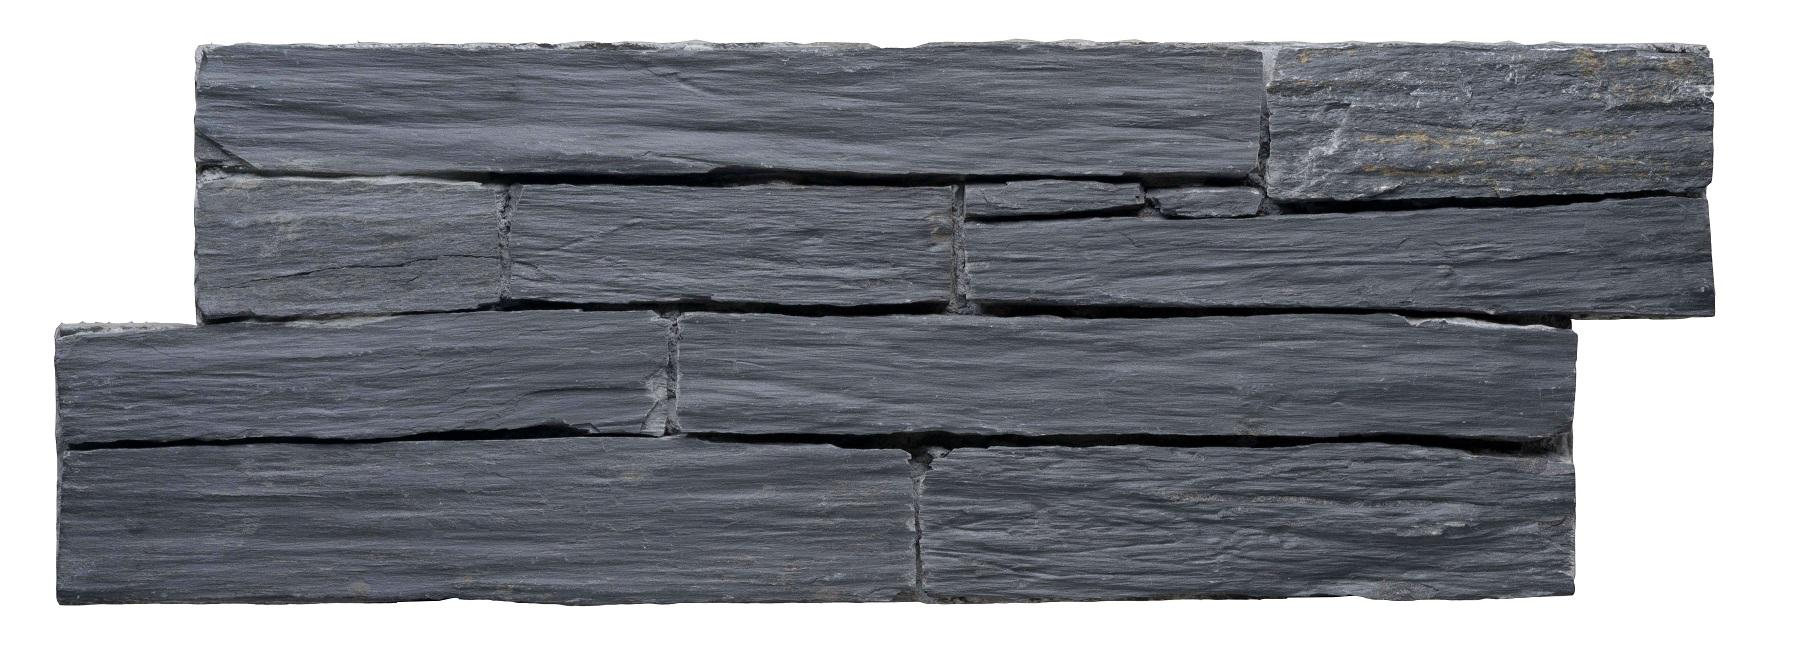 Stonepanel Panel De Piedra Natural Para Fachadasexterior - Piedra-para-revestir-paredes